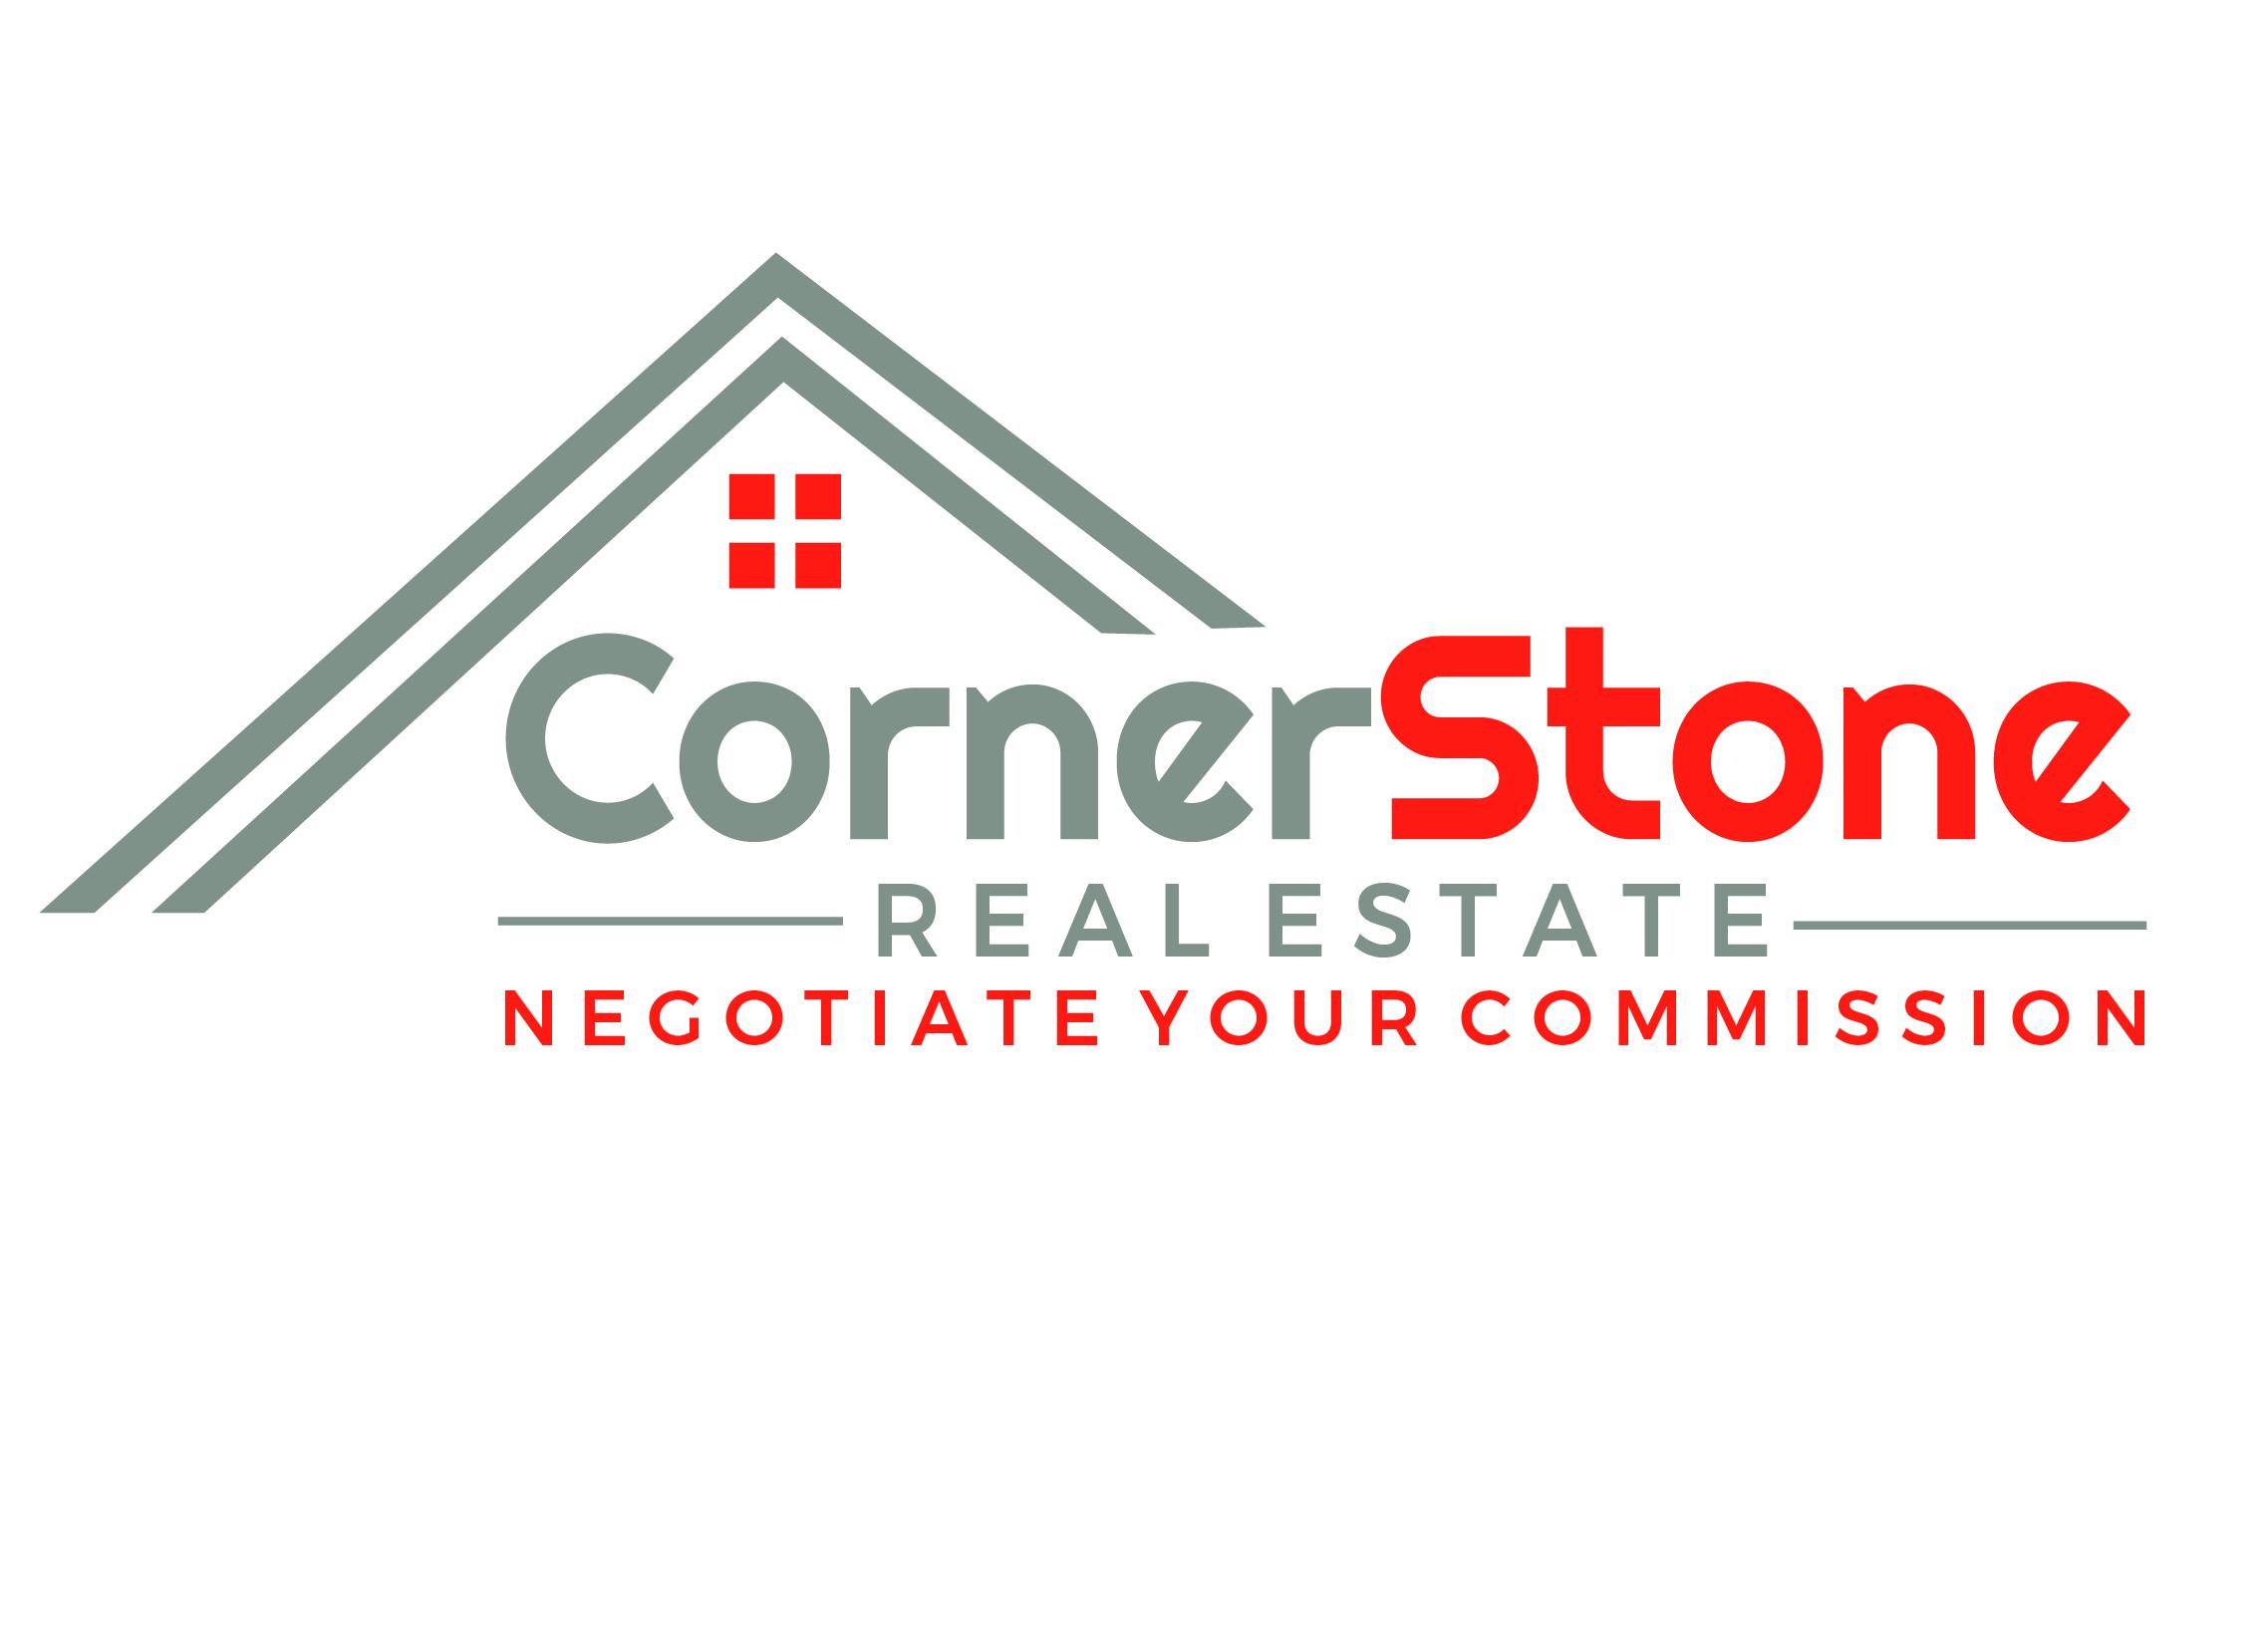 Cornerstone Real Estate, Camira, 4300